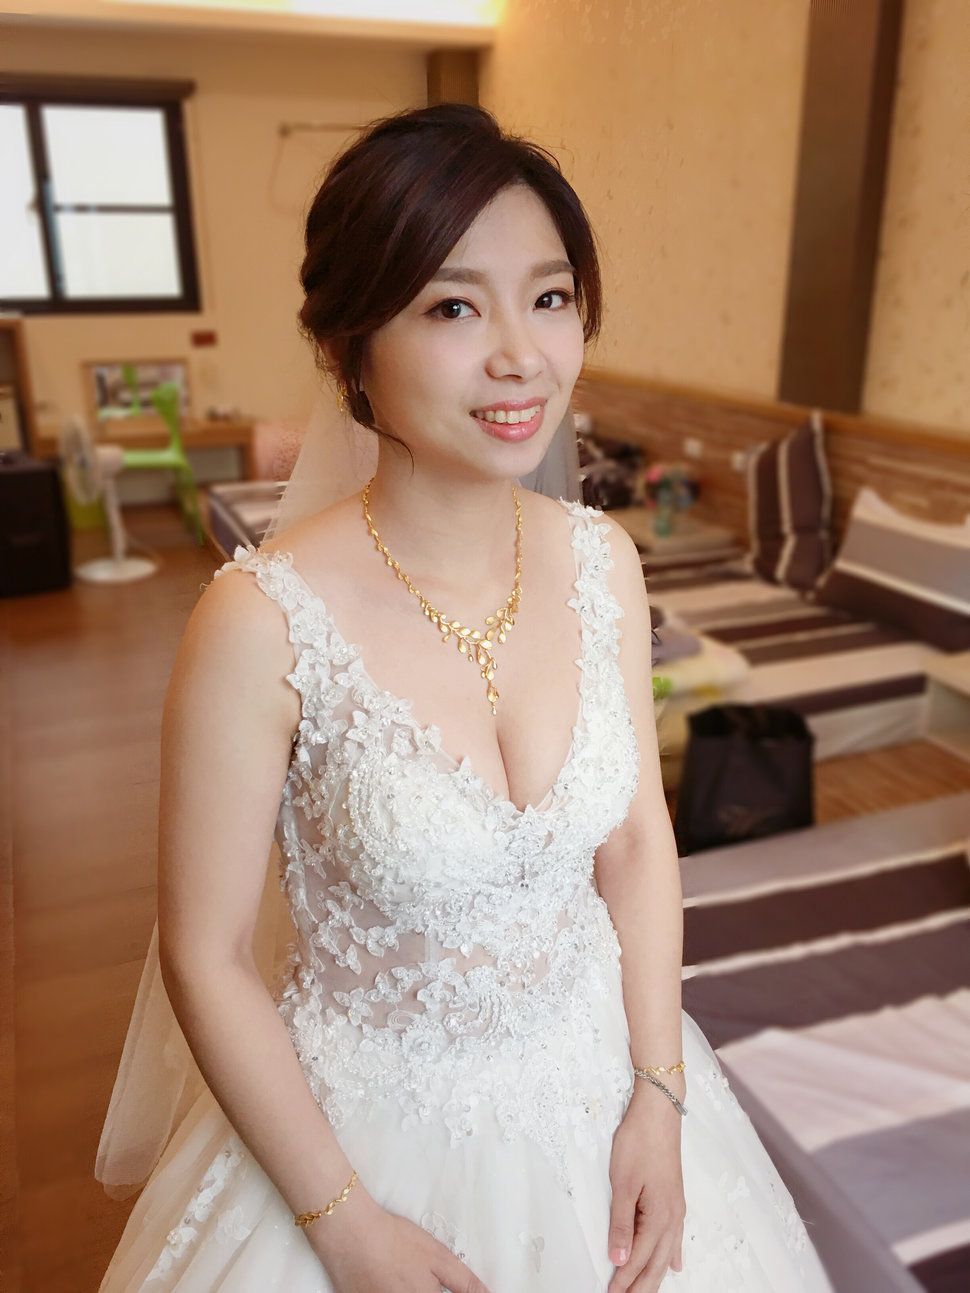 54980387-D91E-4660-ACE7-904F8424F4A6 - 溫妮Winnie.台南新娘秘書/彩妝造型 - 結婚吧